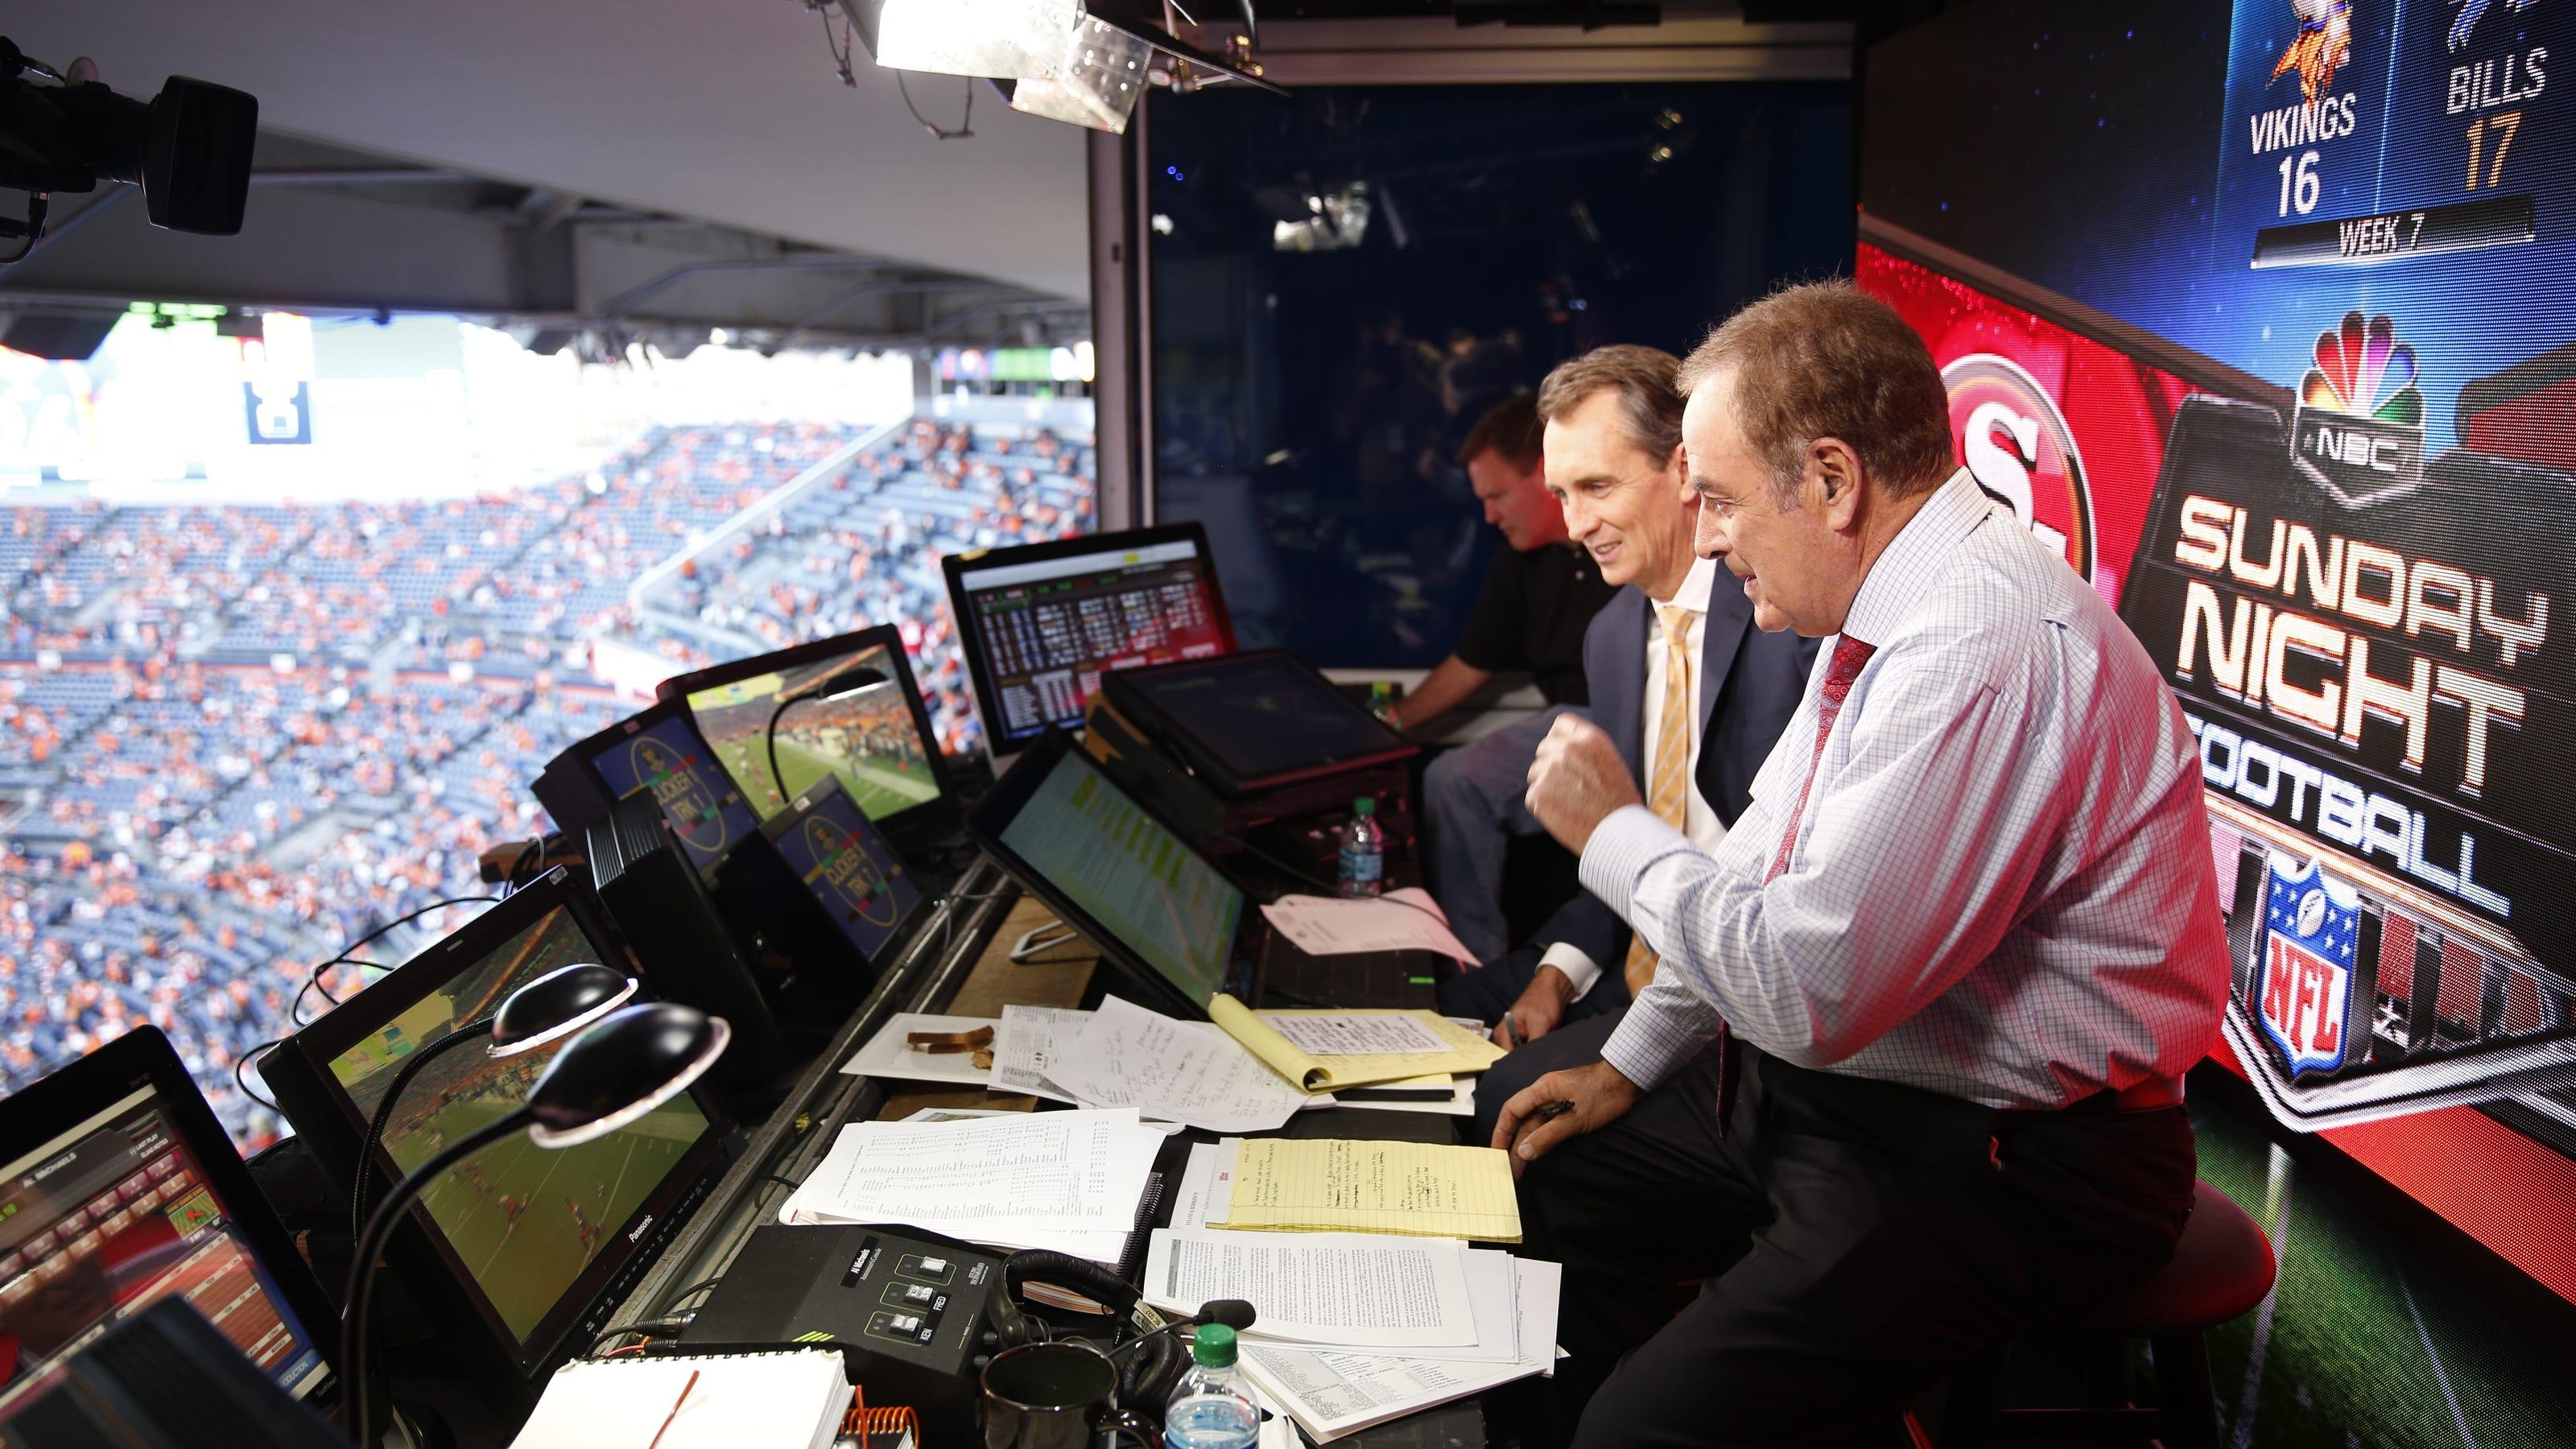 Sunday Night Football Al Michaels Cris Collinsworth On The Big Game